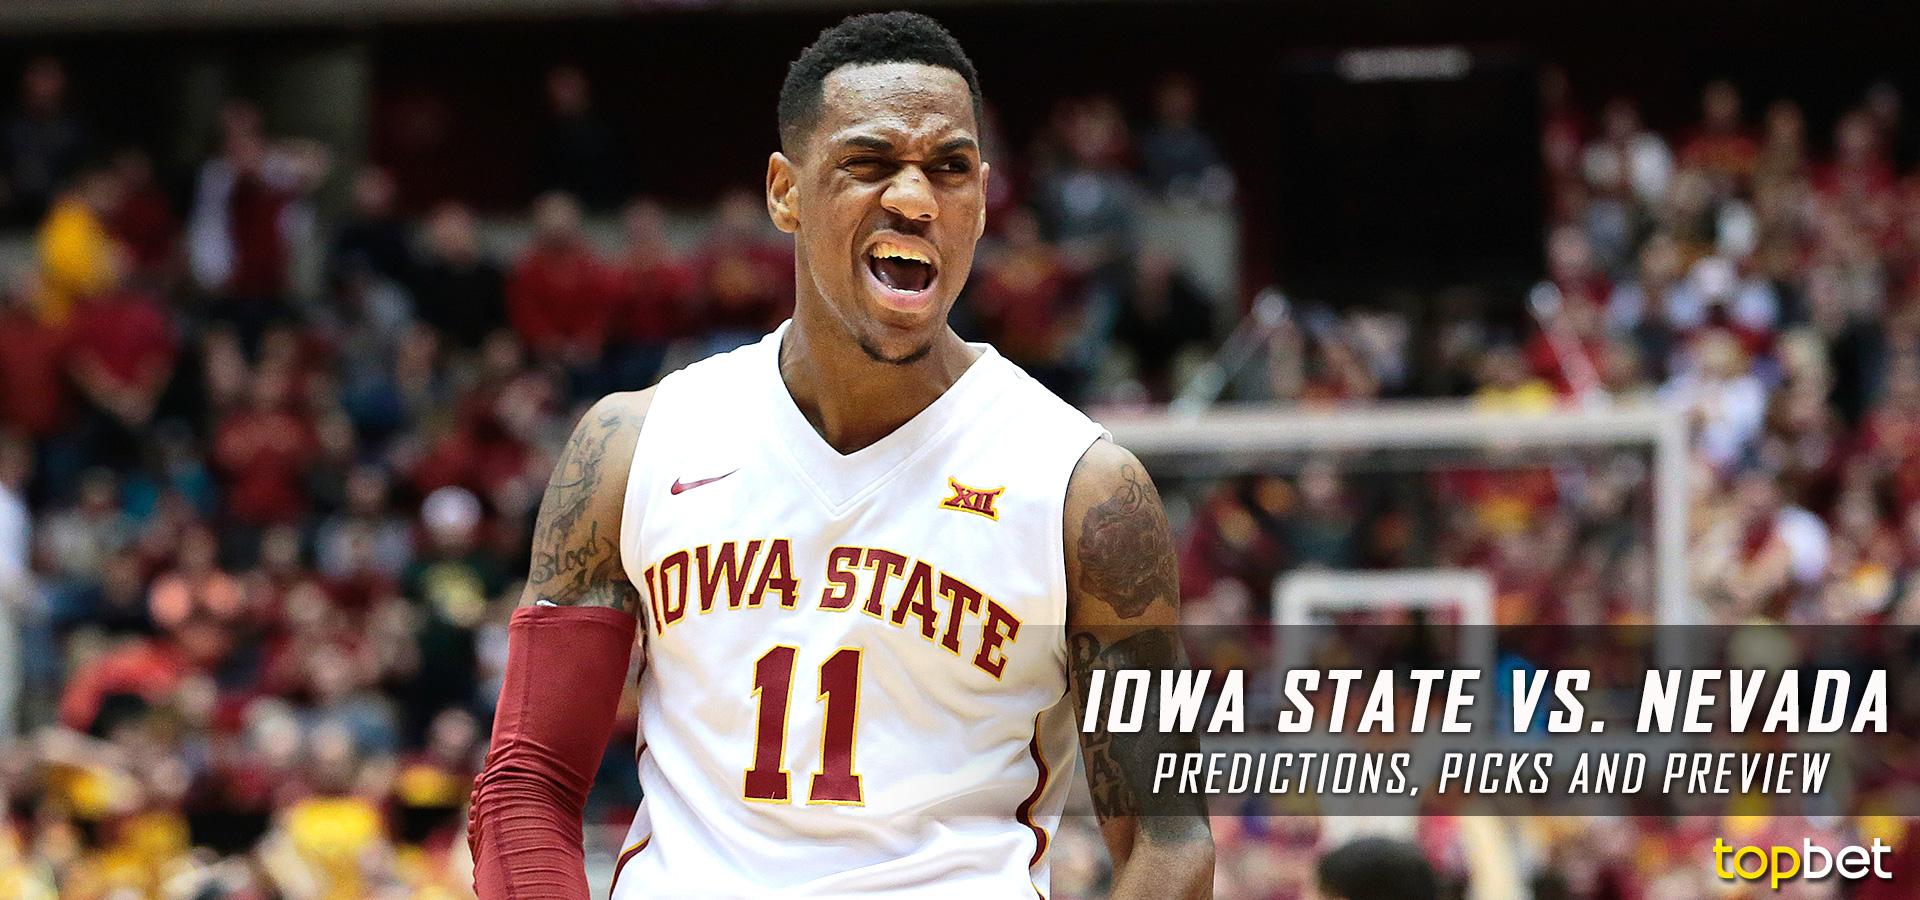 Missouri basketball-Iowa State: Live updates, stats